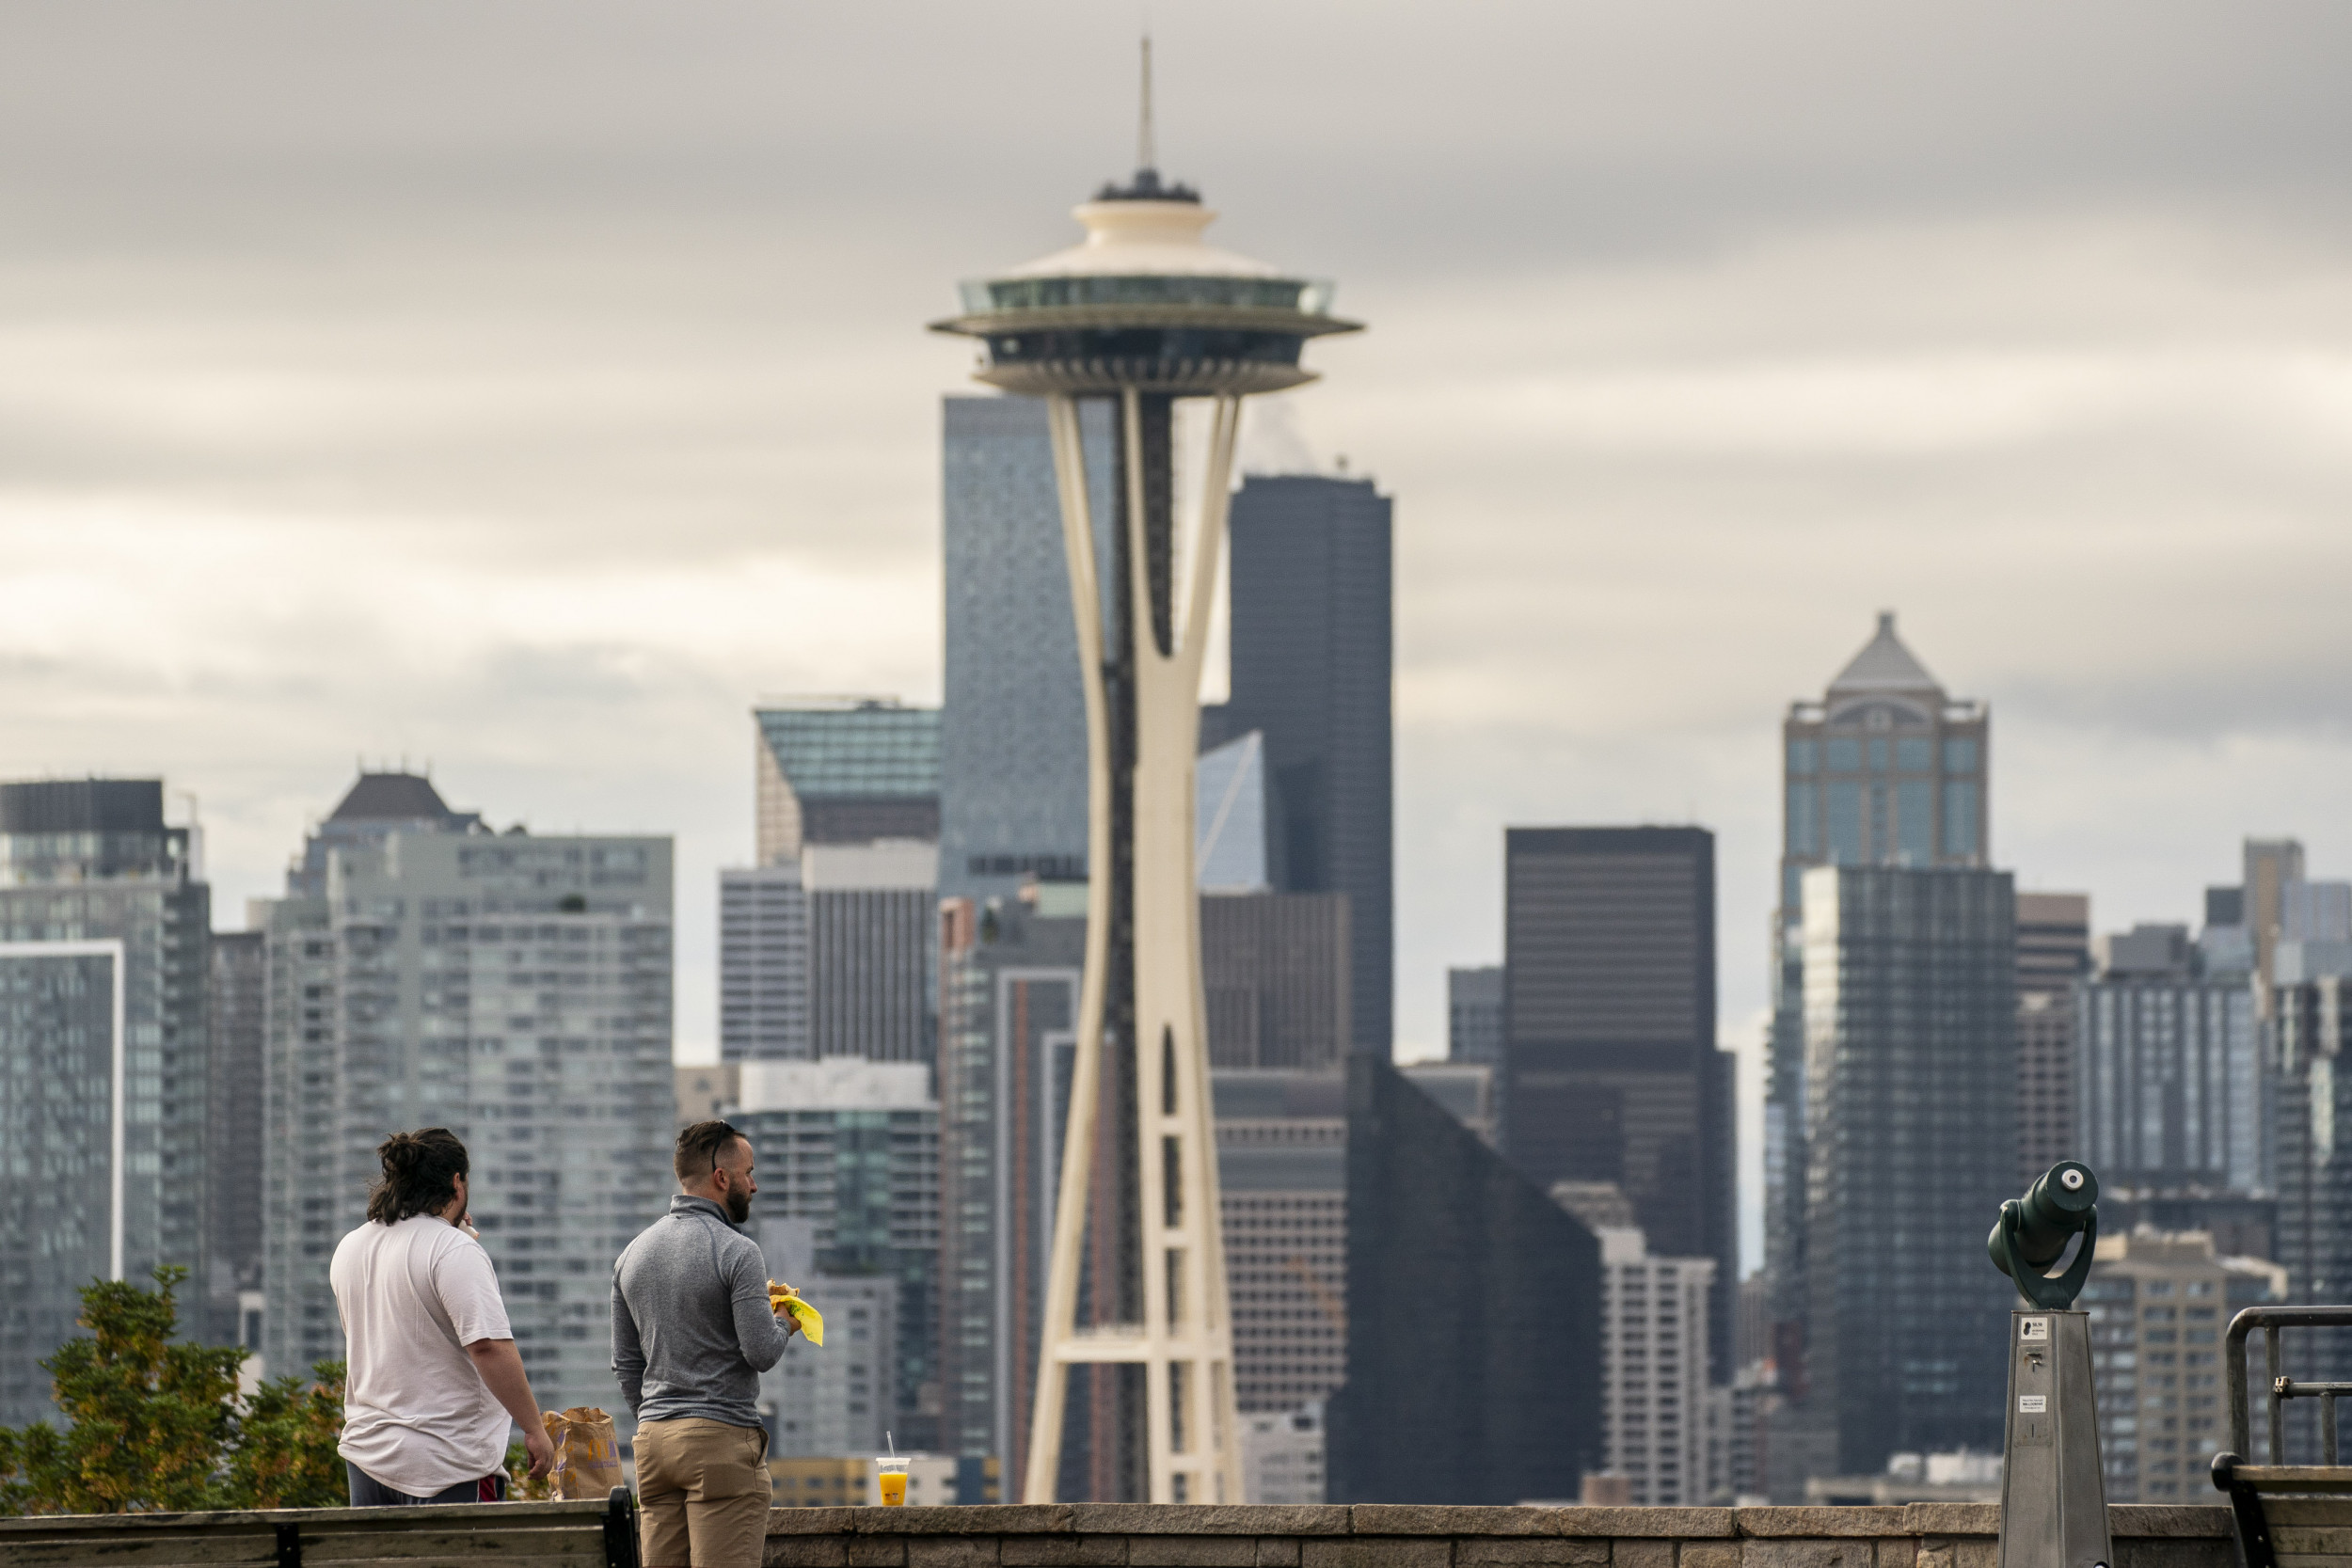 'Rain City' Faces 47-Day Dry Streak as Seattle Hits 4th-Longest Drought